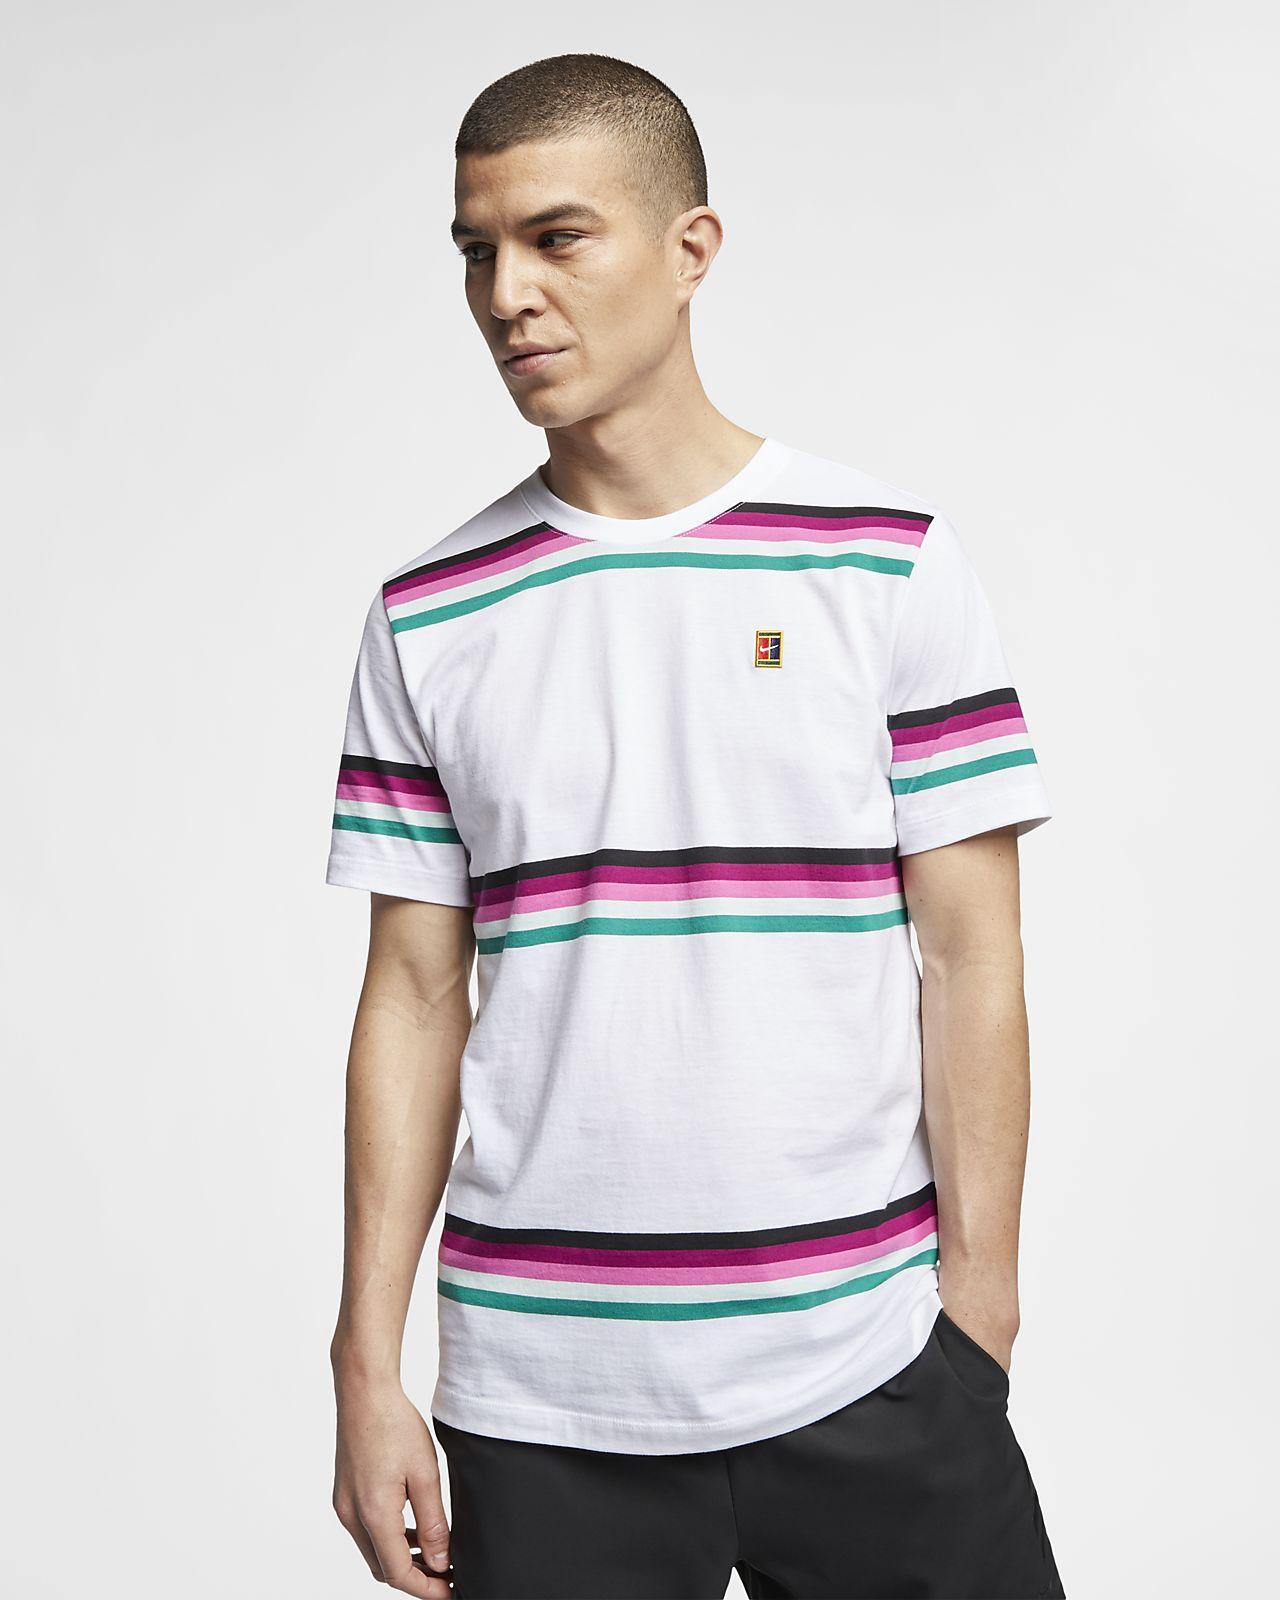 NikeCourt Men's Striped Tennis T-Shirt